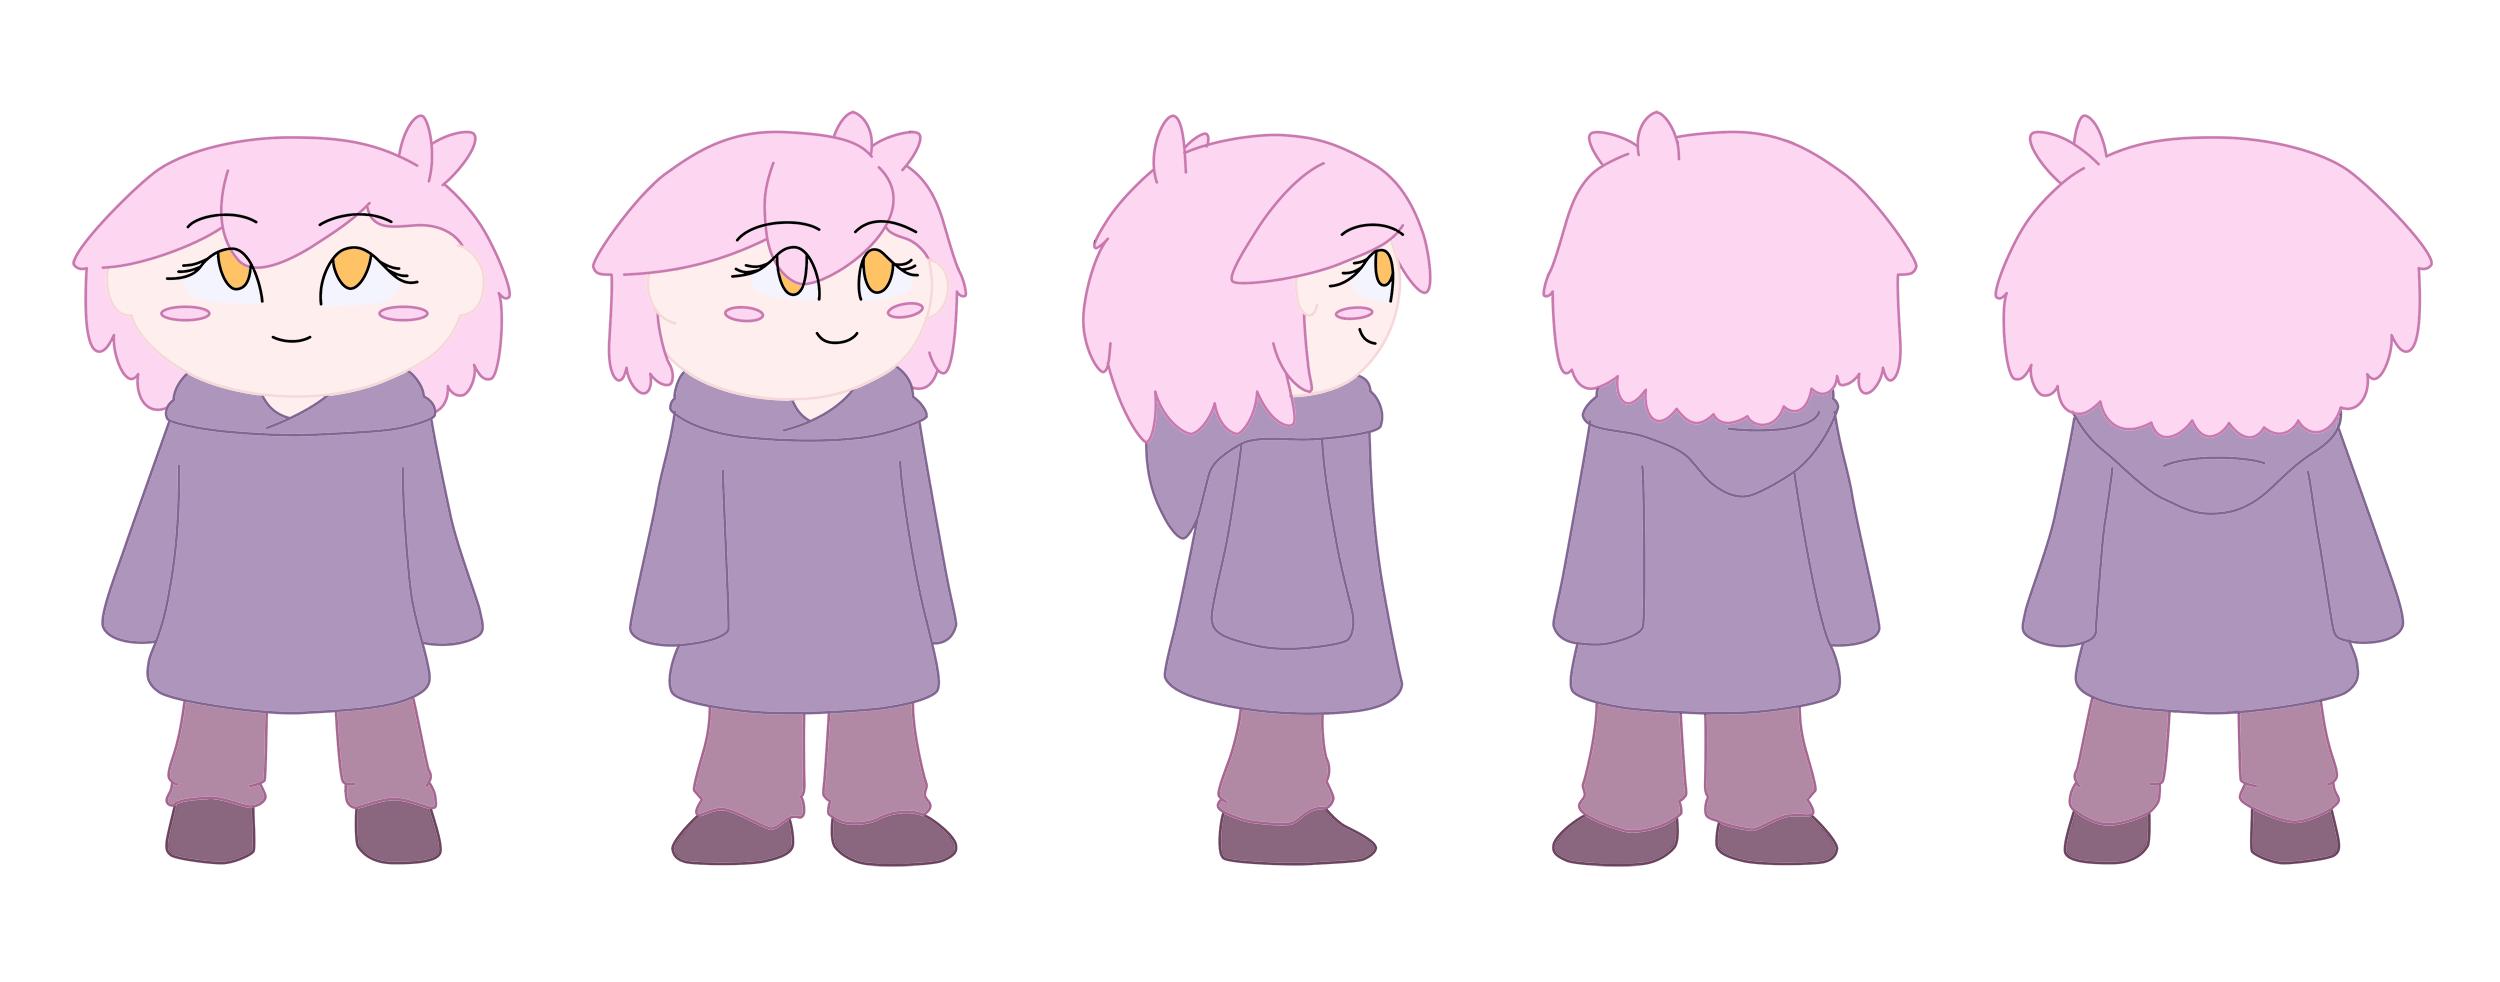 First Draft of Luna's Turnaround